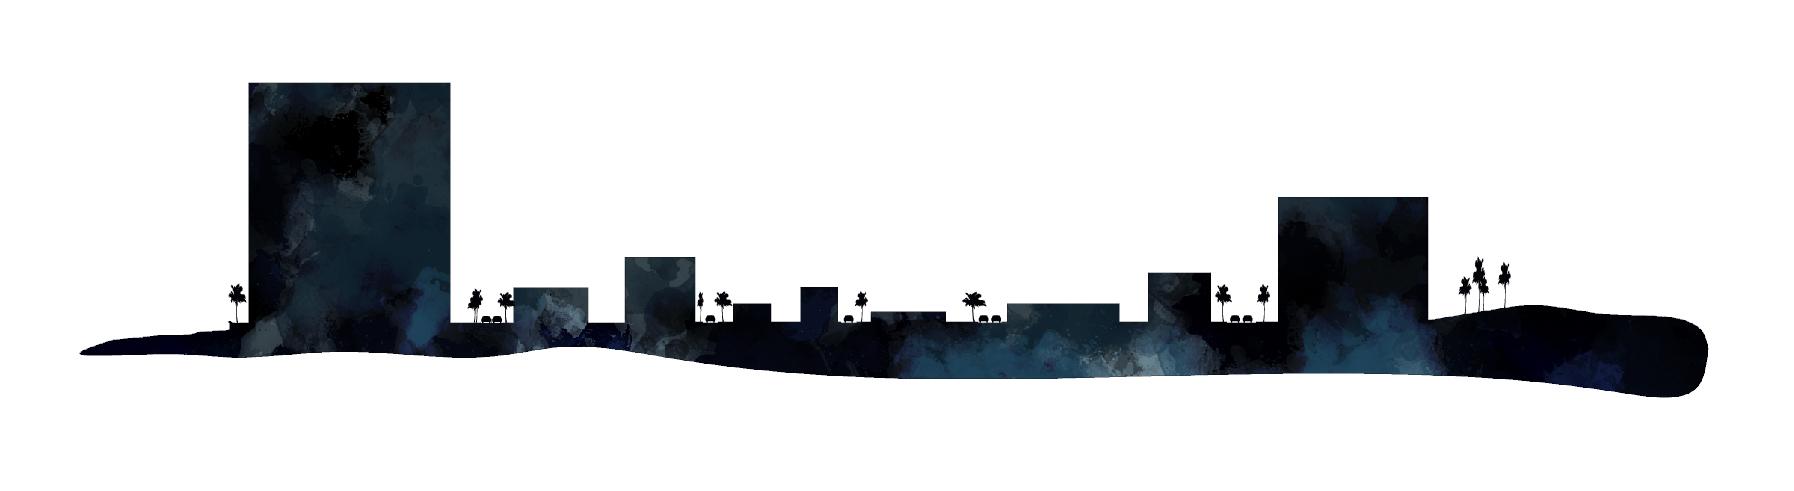 Current Urban Condition